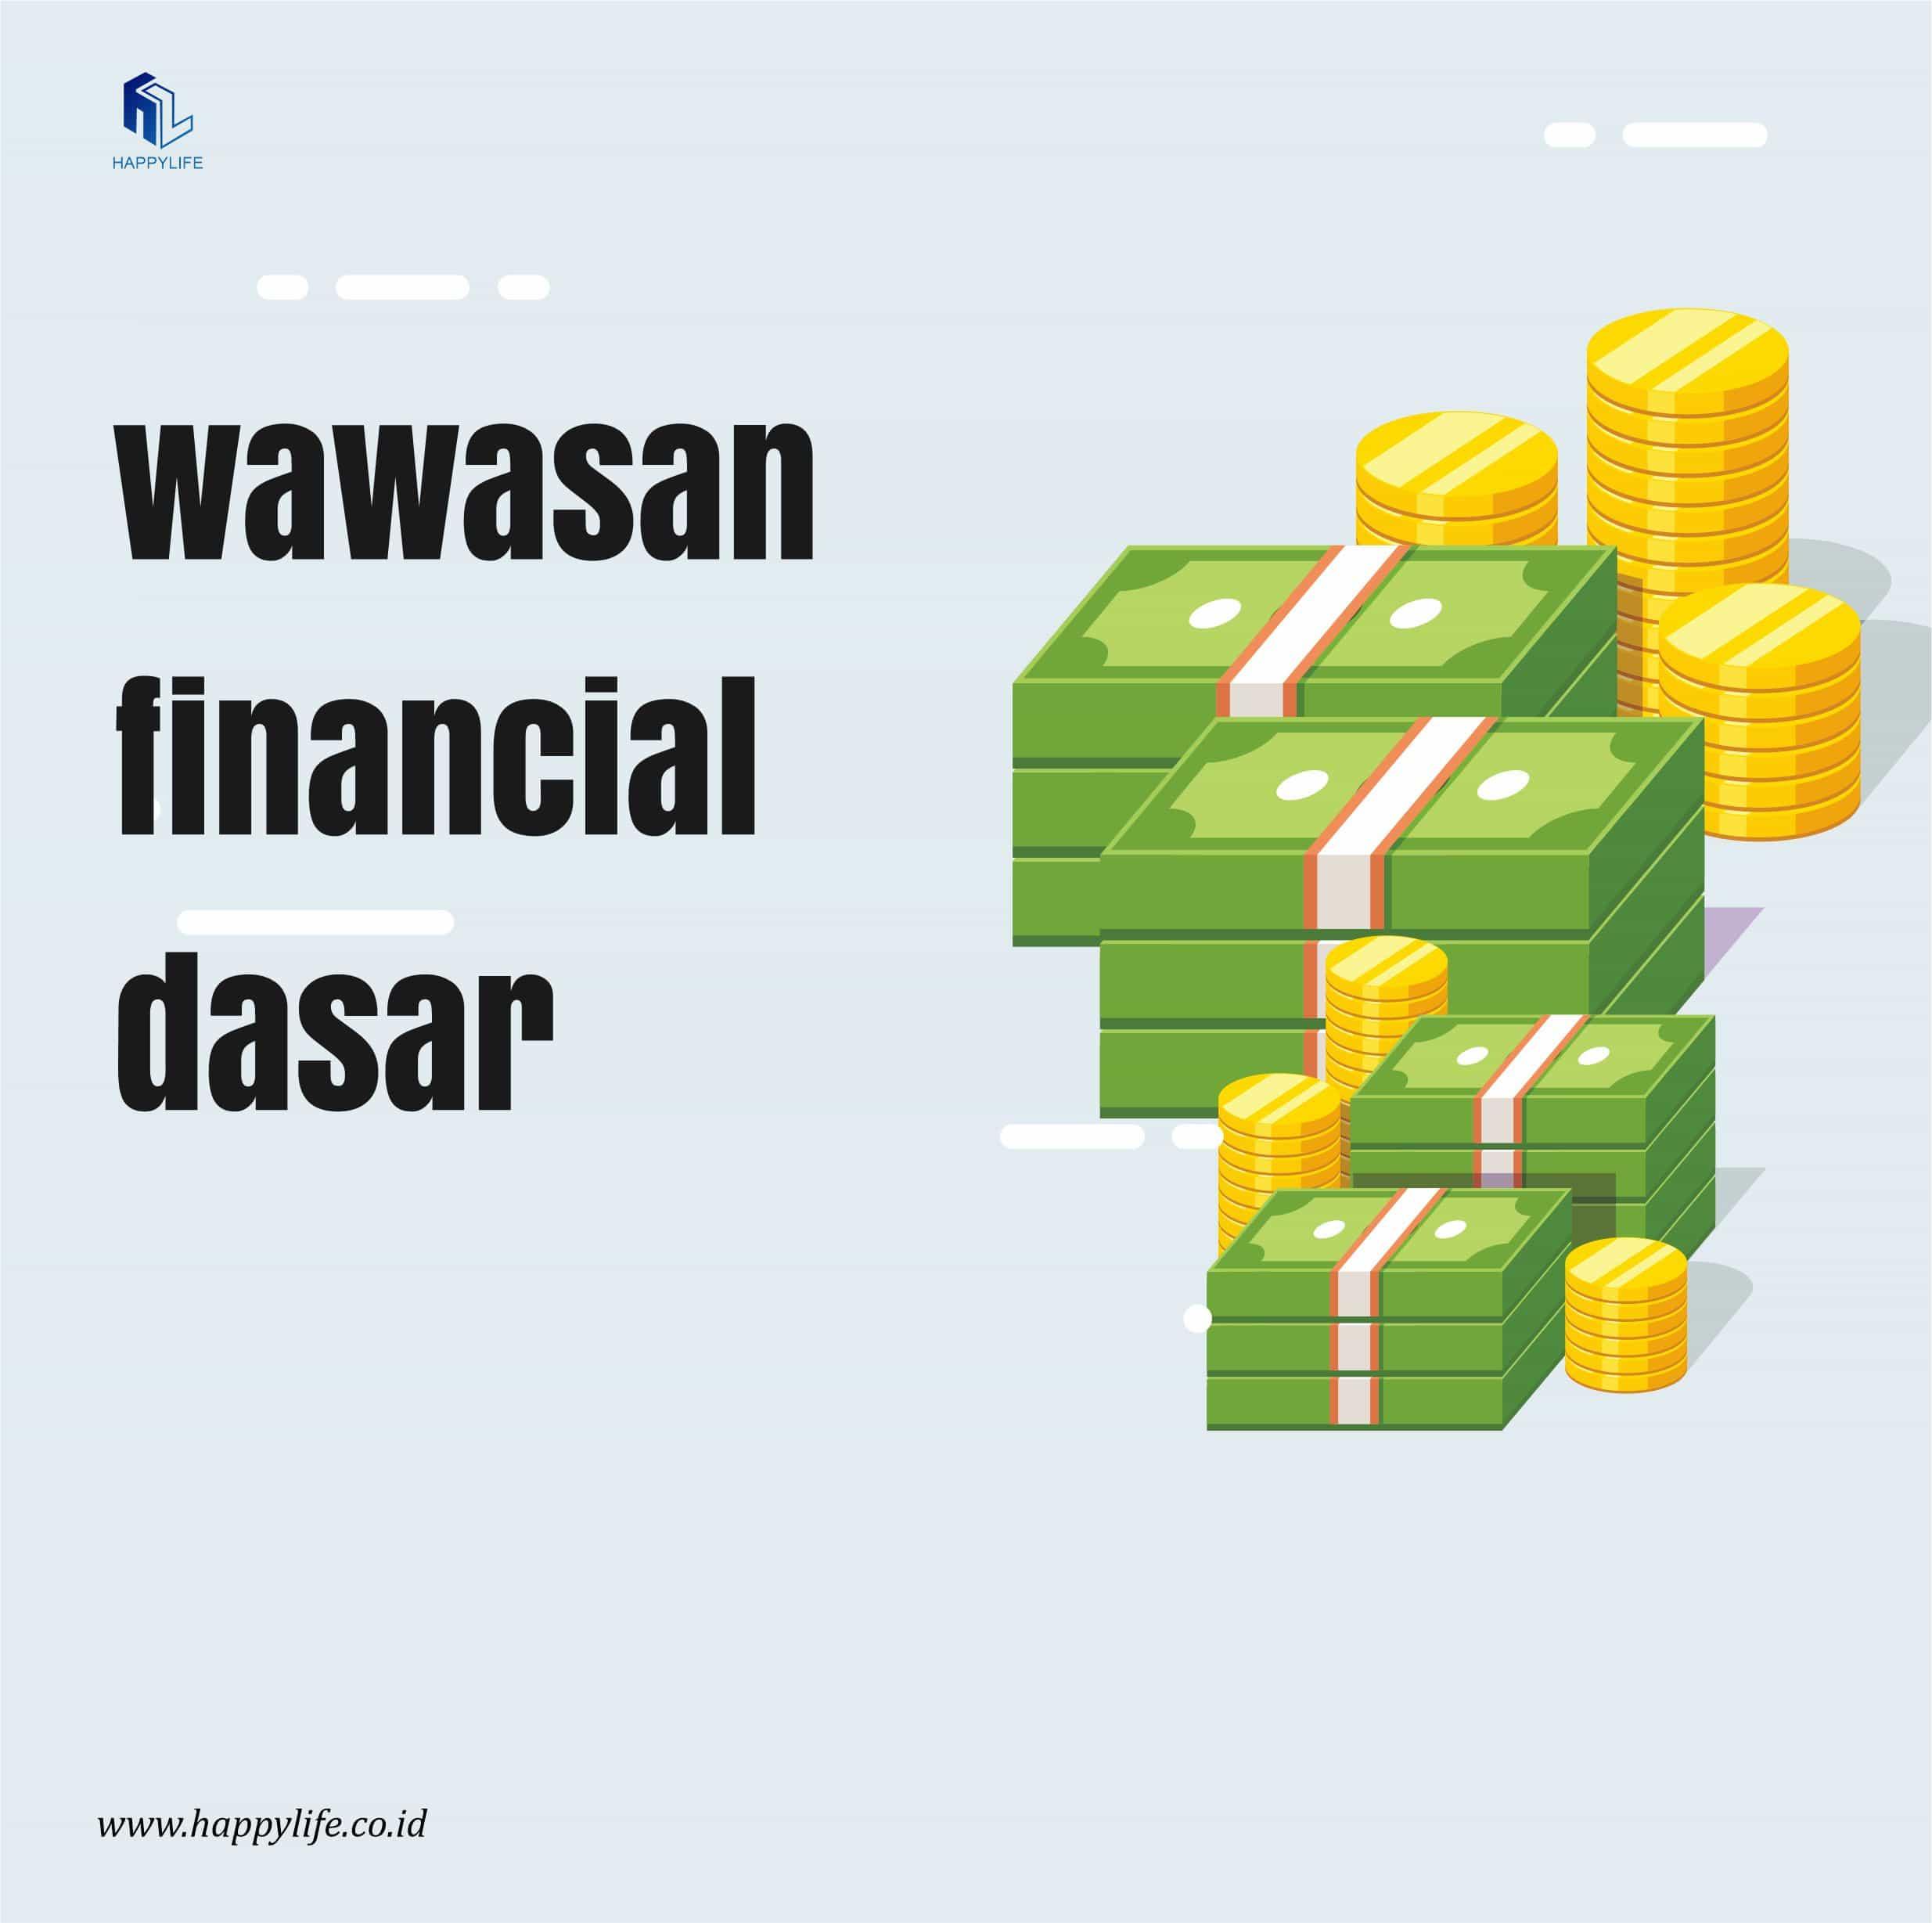 Wawasan Finansial Dasar